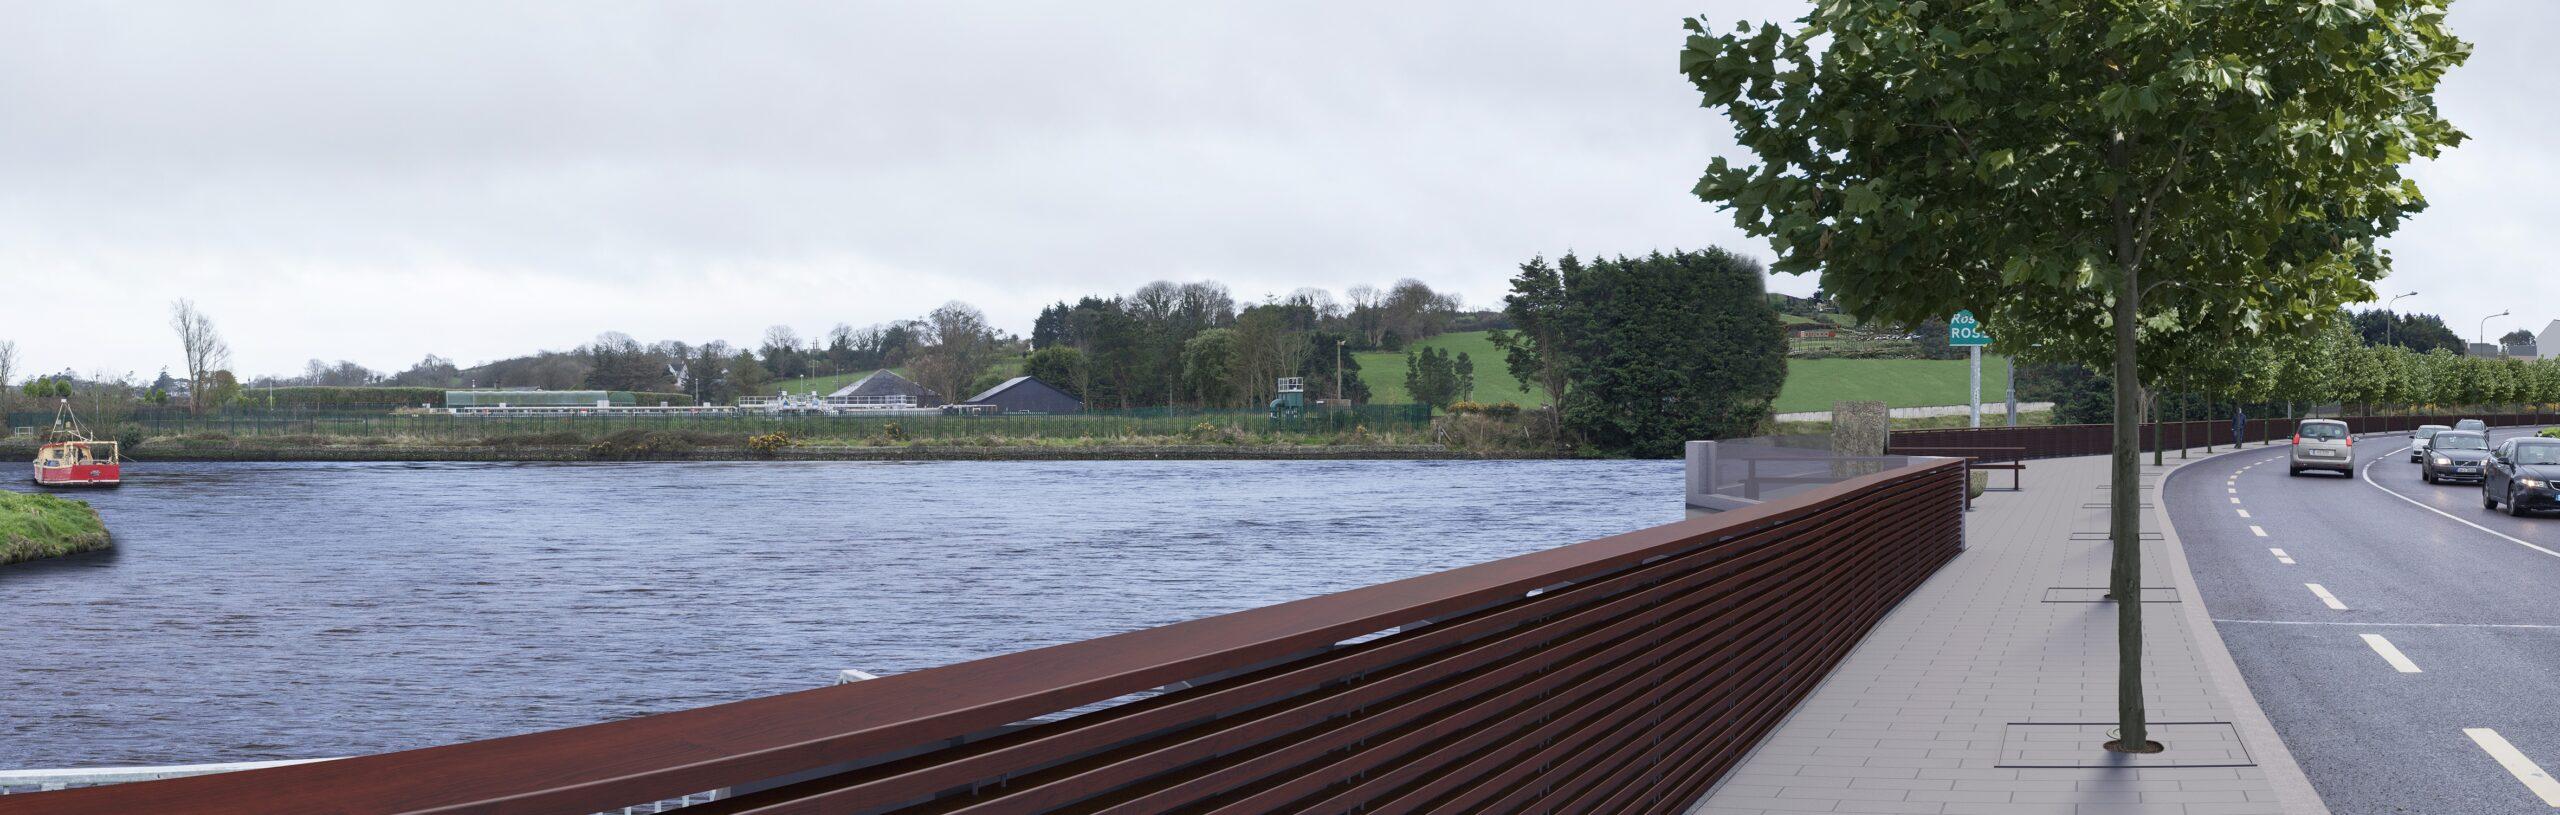 Clonakilty flood scheme complete: O'Sullivan